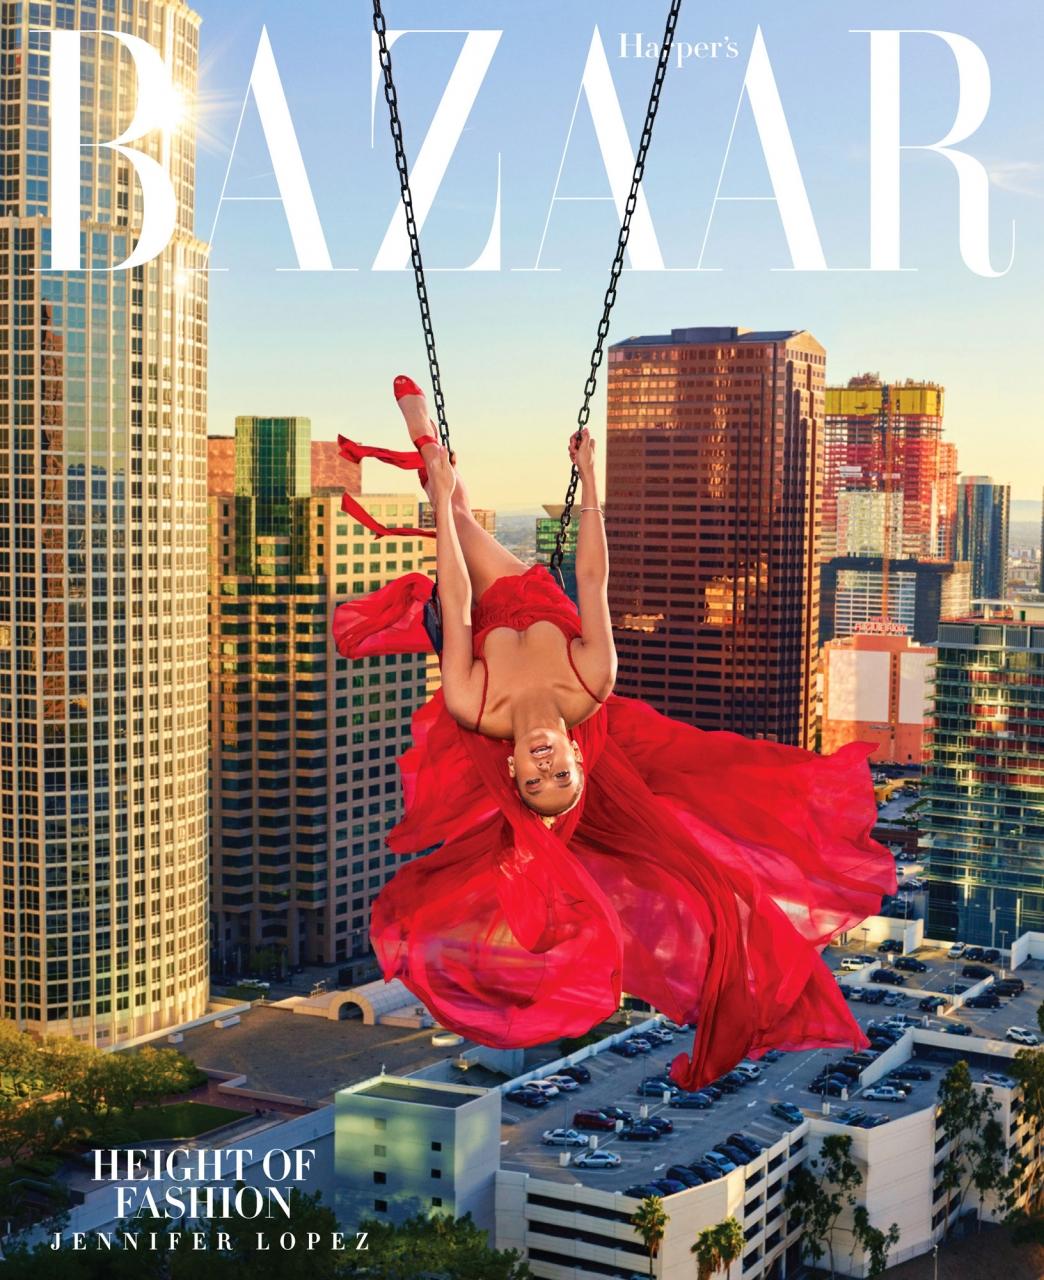 Jennifer Lopez by Mariano Vivanco for Harper's Bazaar, April 2018